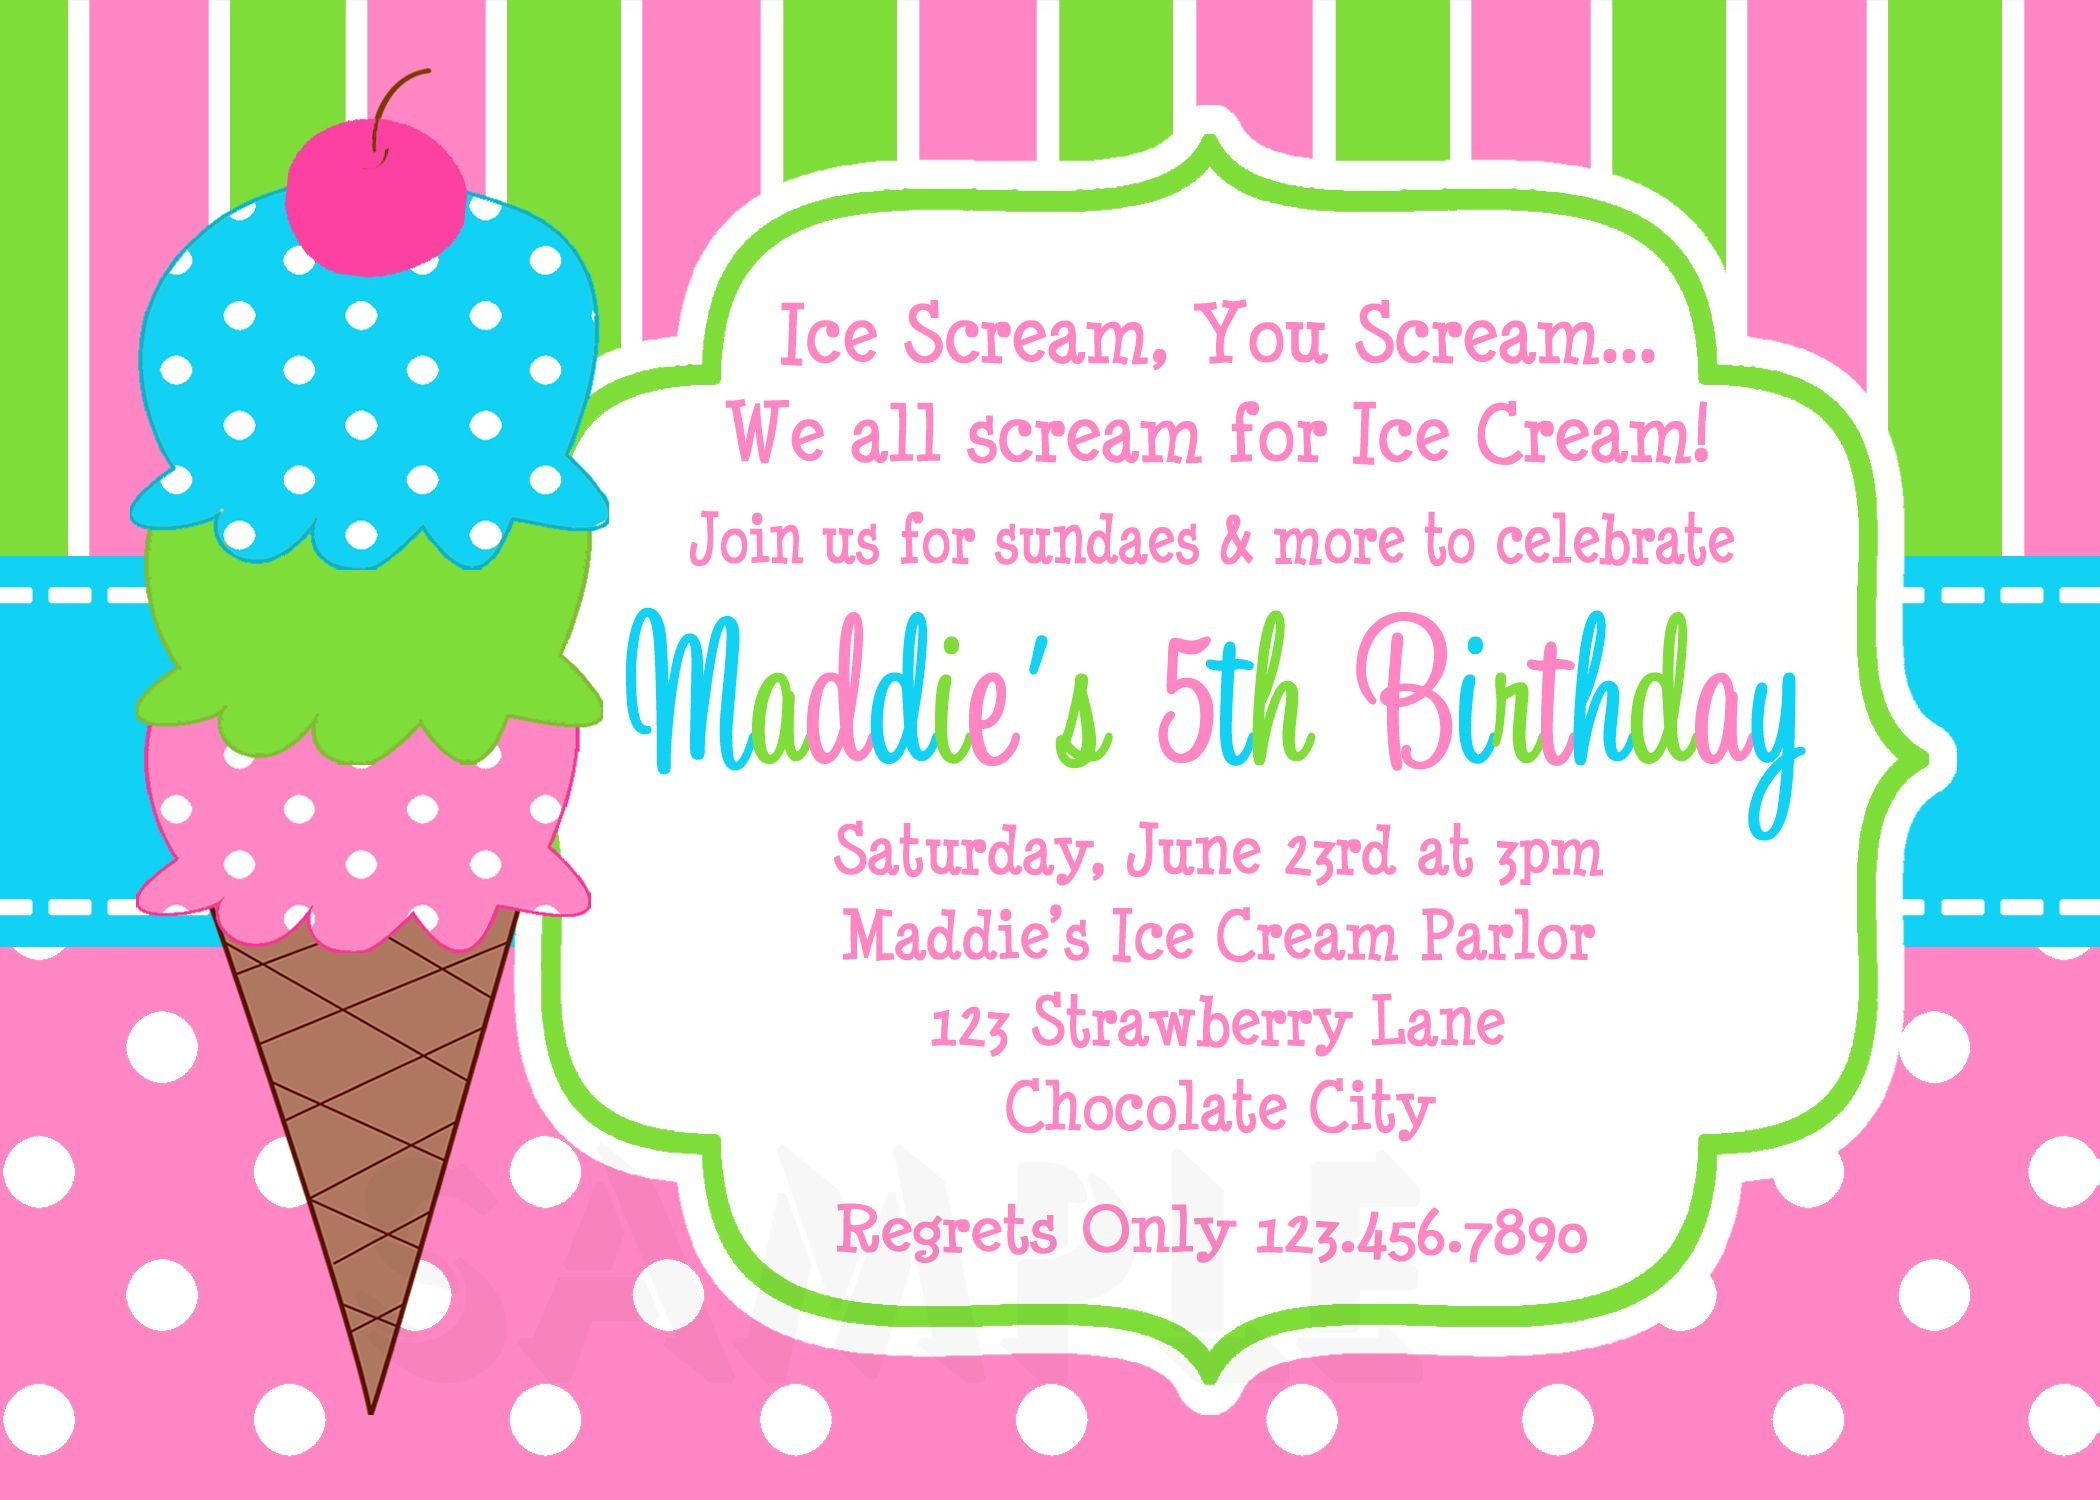 Ice Cream Birthday Party Invitations Pink Green In 2019 | Party - Ice Cream Party Invitations Printable Free